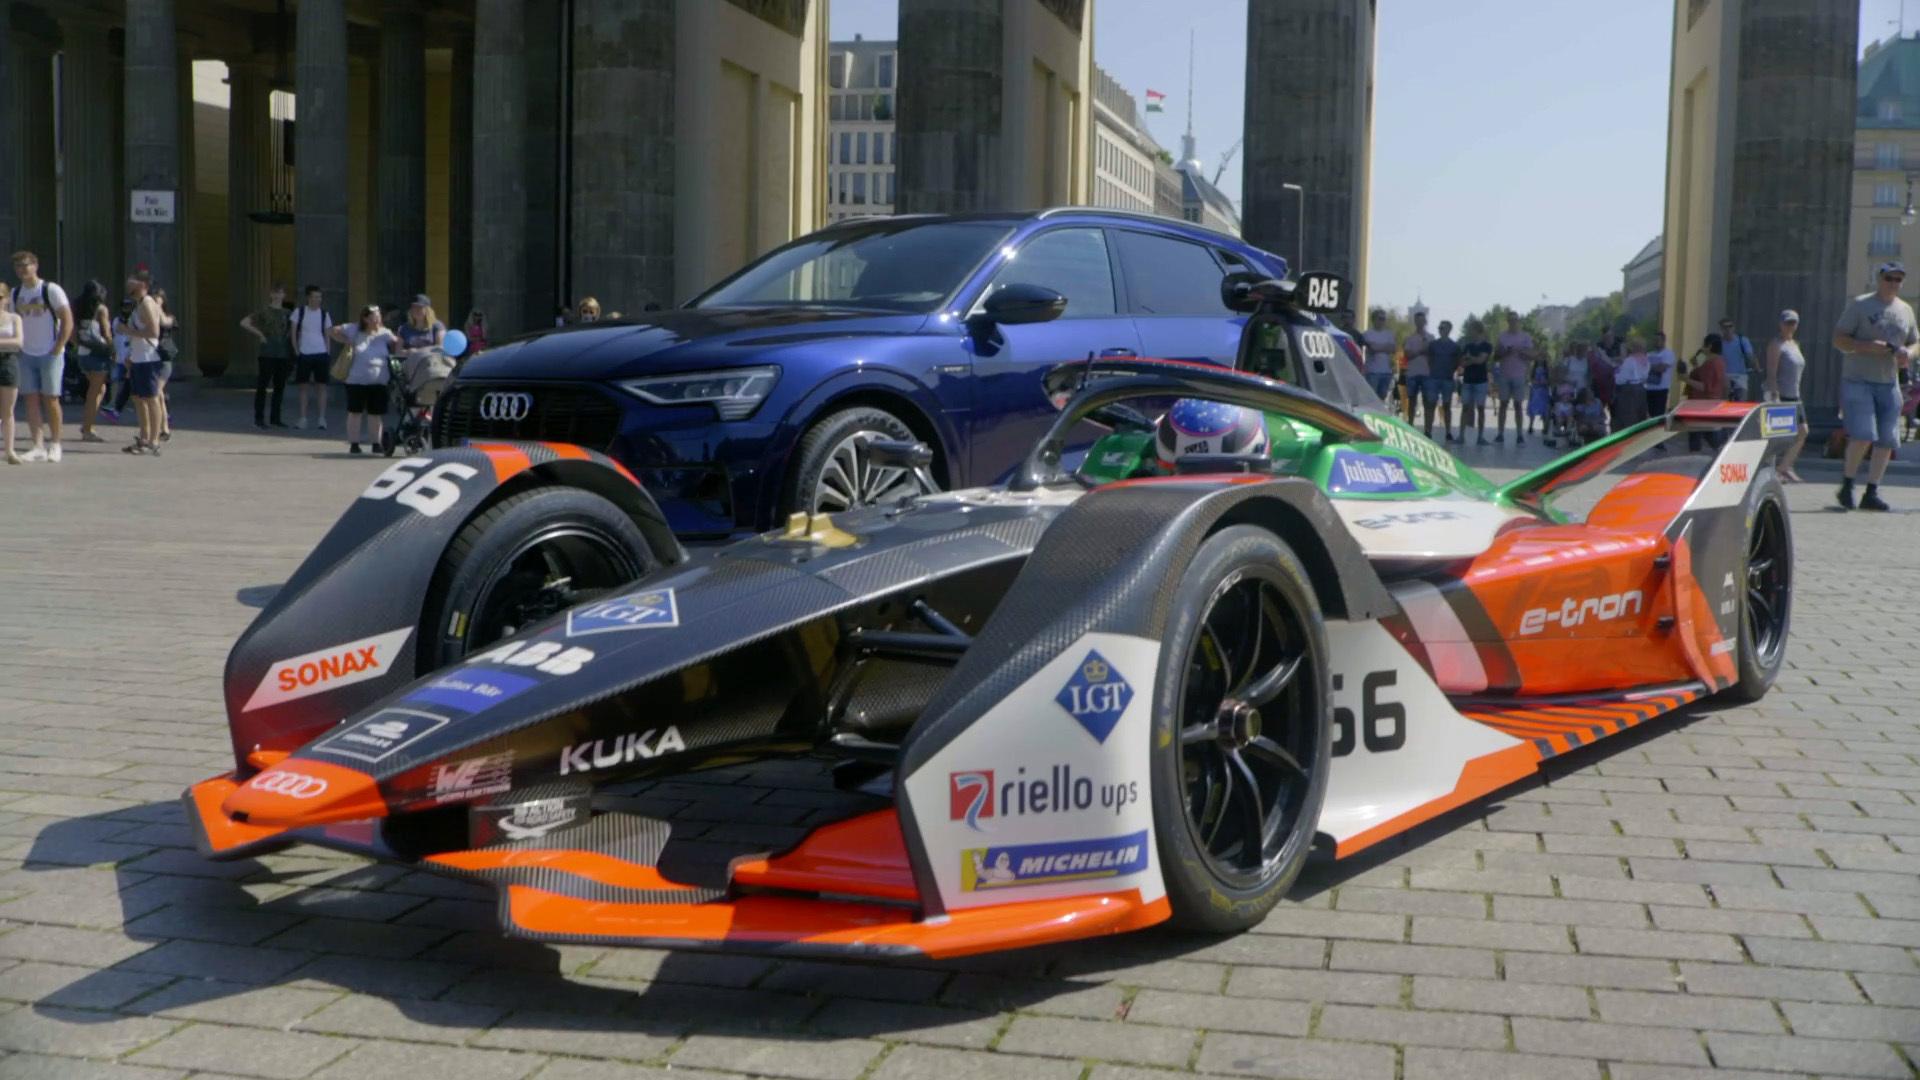 Audi Sport Formula E: Audi electrifies Berlin